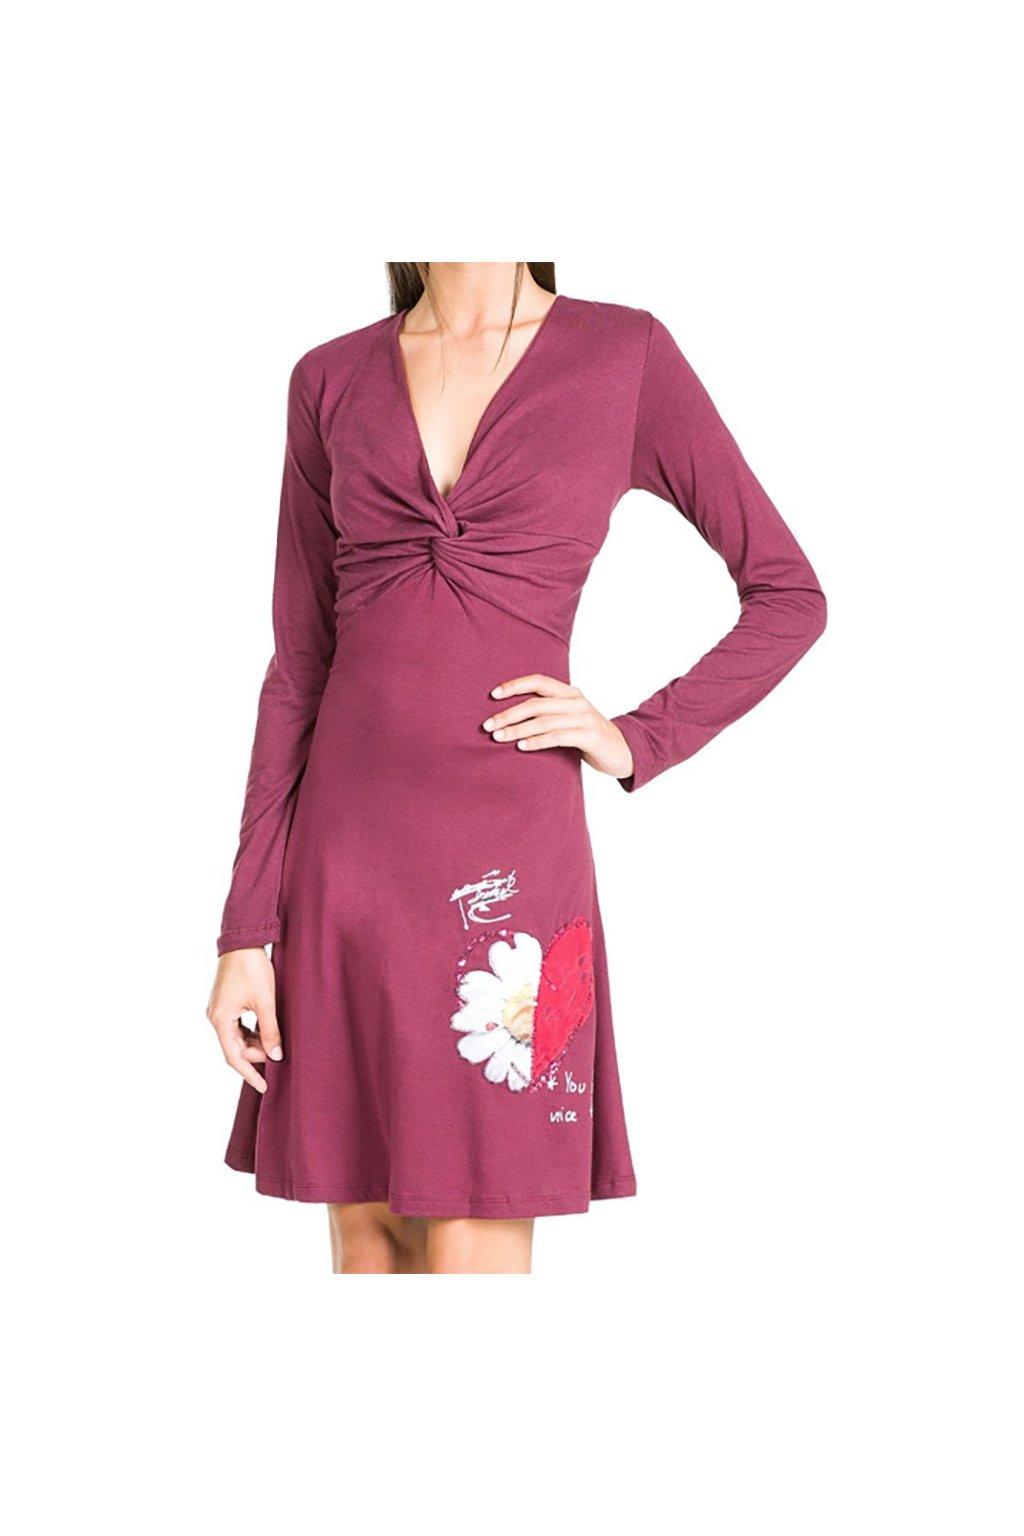 Vínové šaty drobnou aplikací Desigual